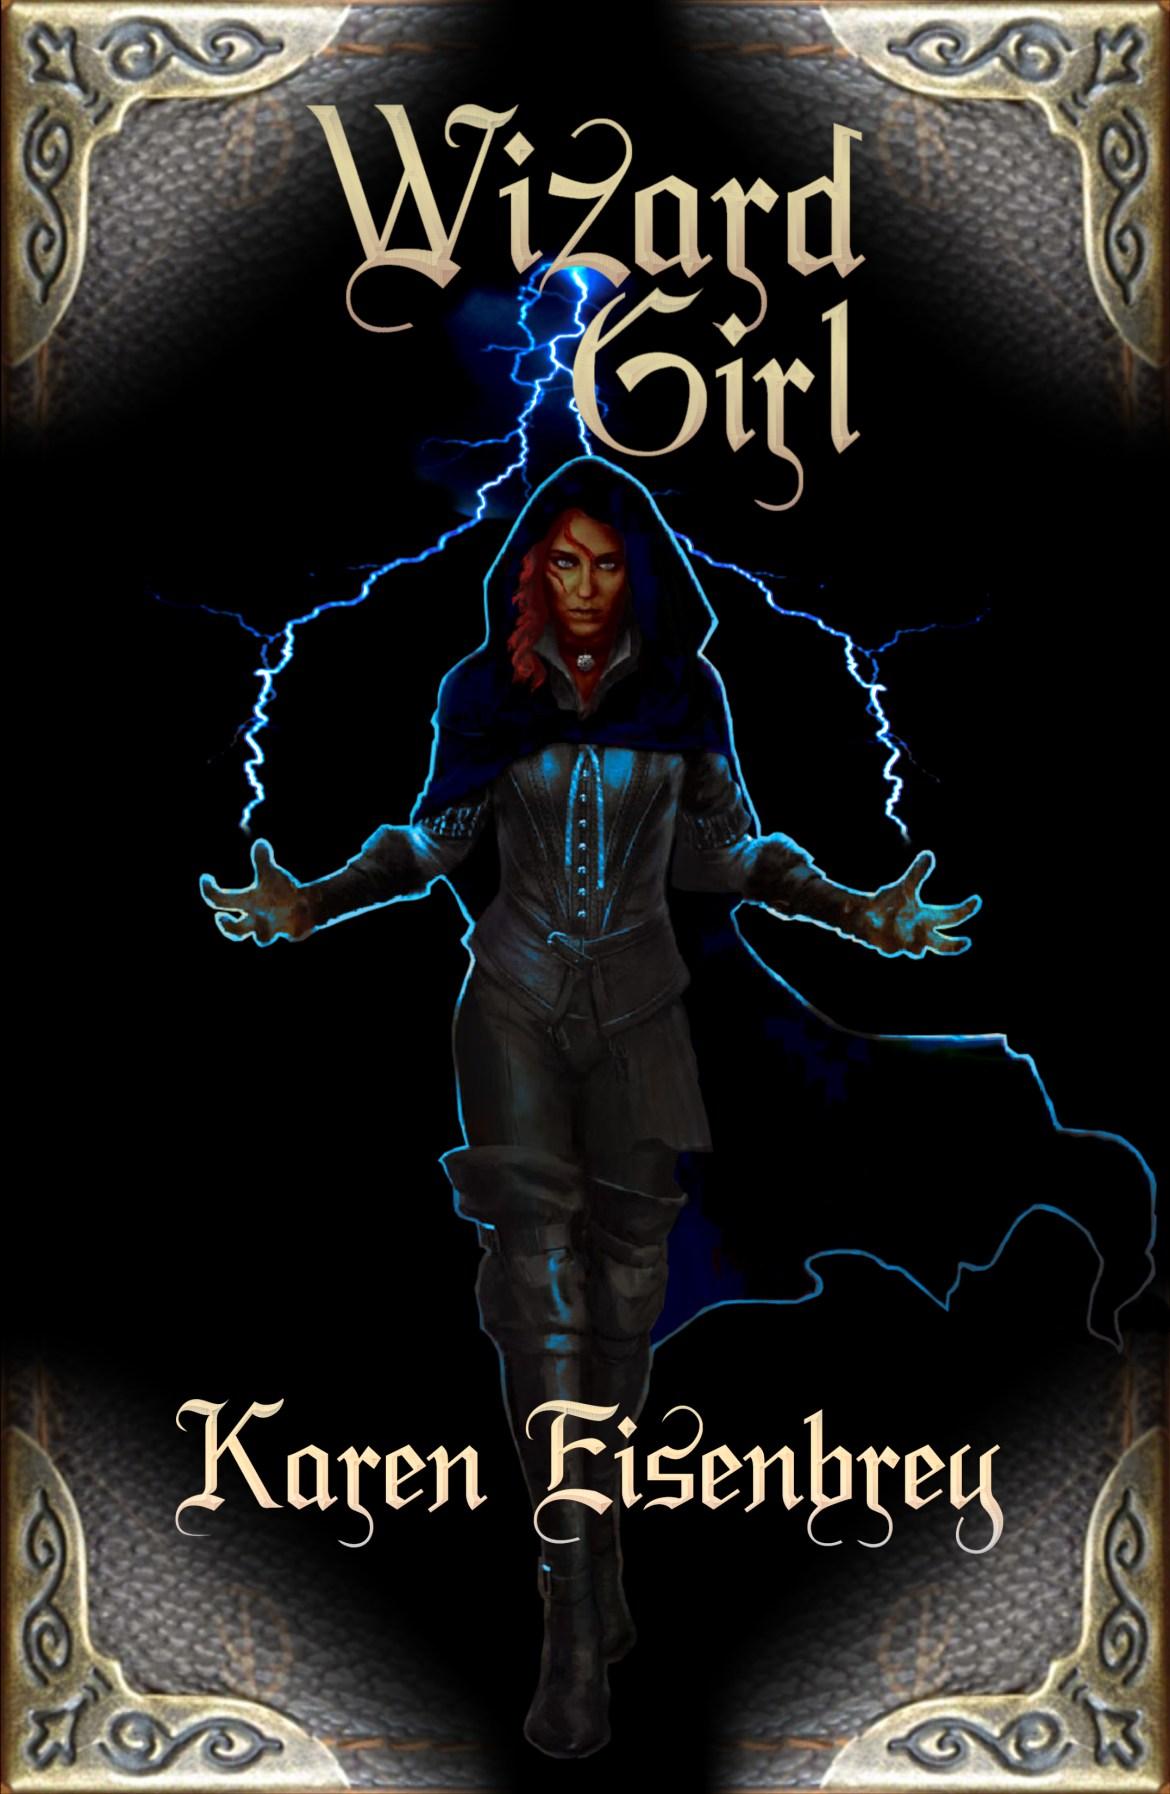 Wizard Girl eBook Cover edit 1.jpg